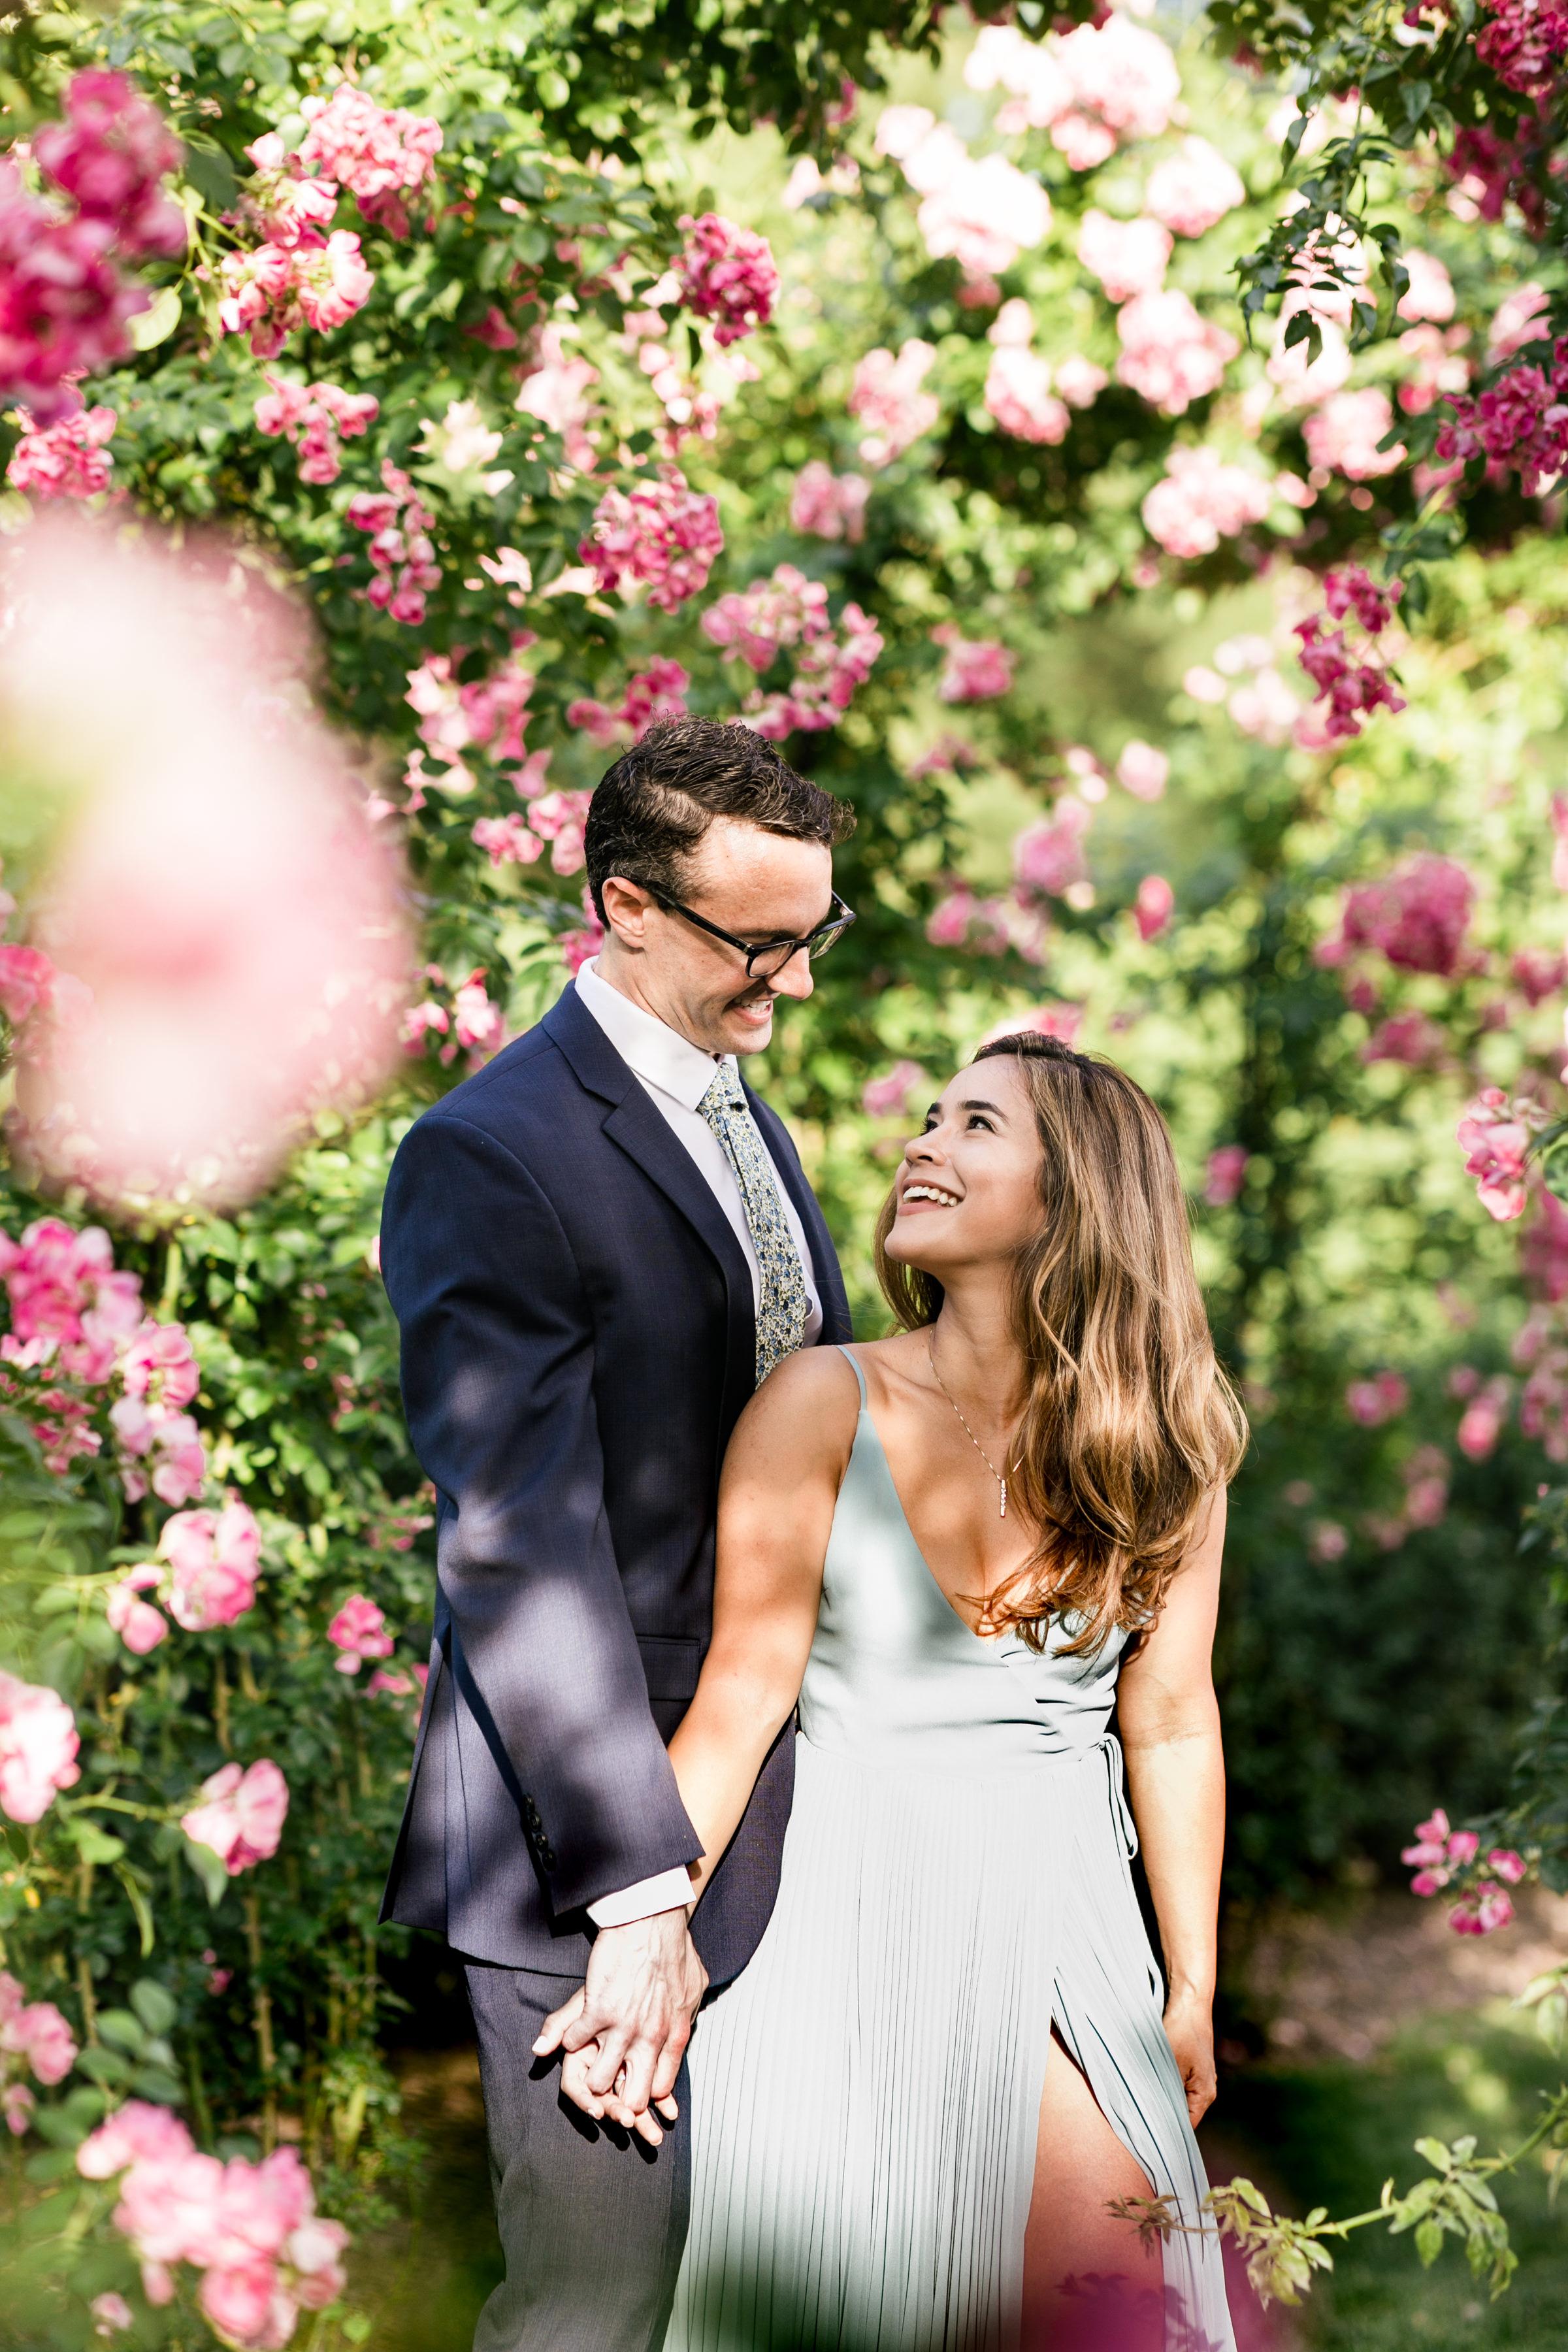 photography-natural-candid-engaged-proposal-philadelphia-wedding-longwood gardends-nature-flowers-modern-lifestyle-14.JPG